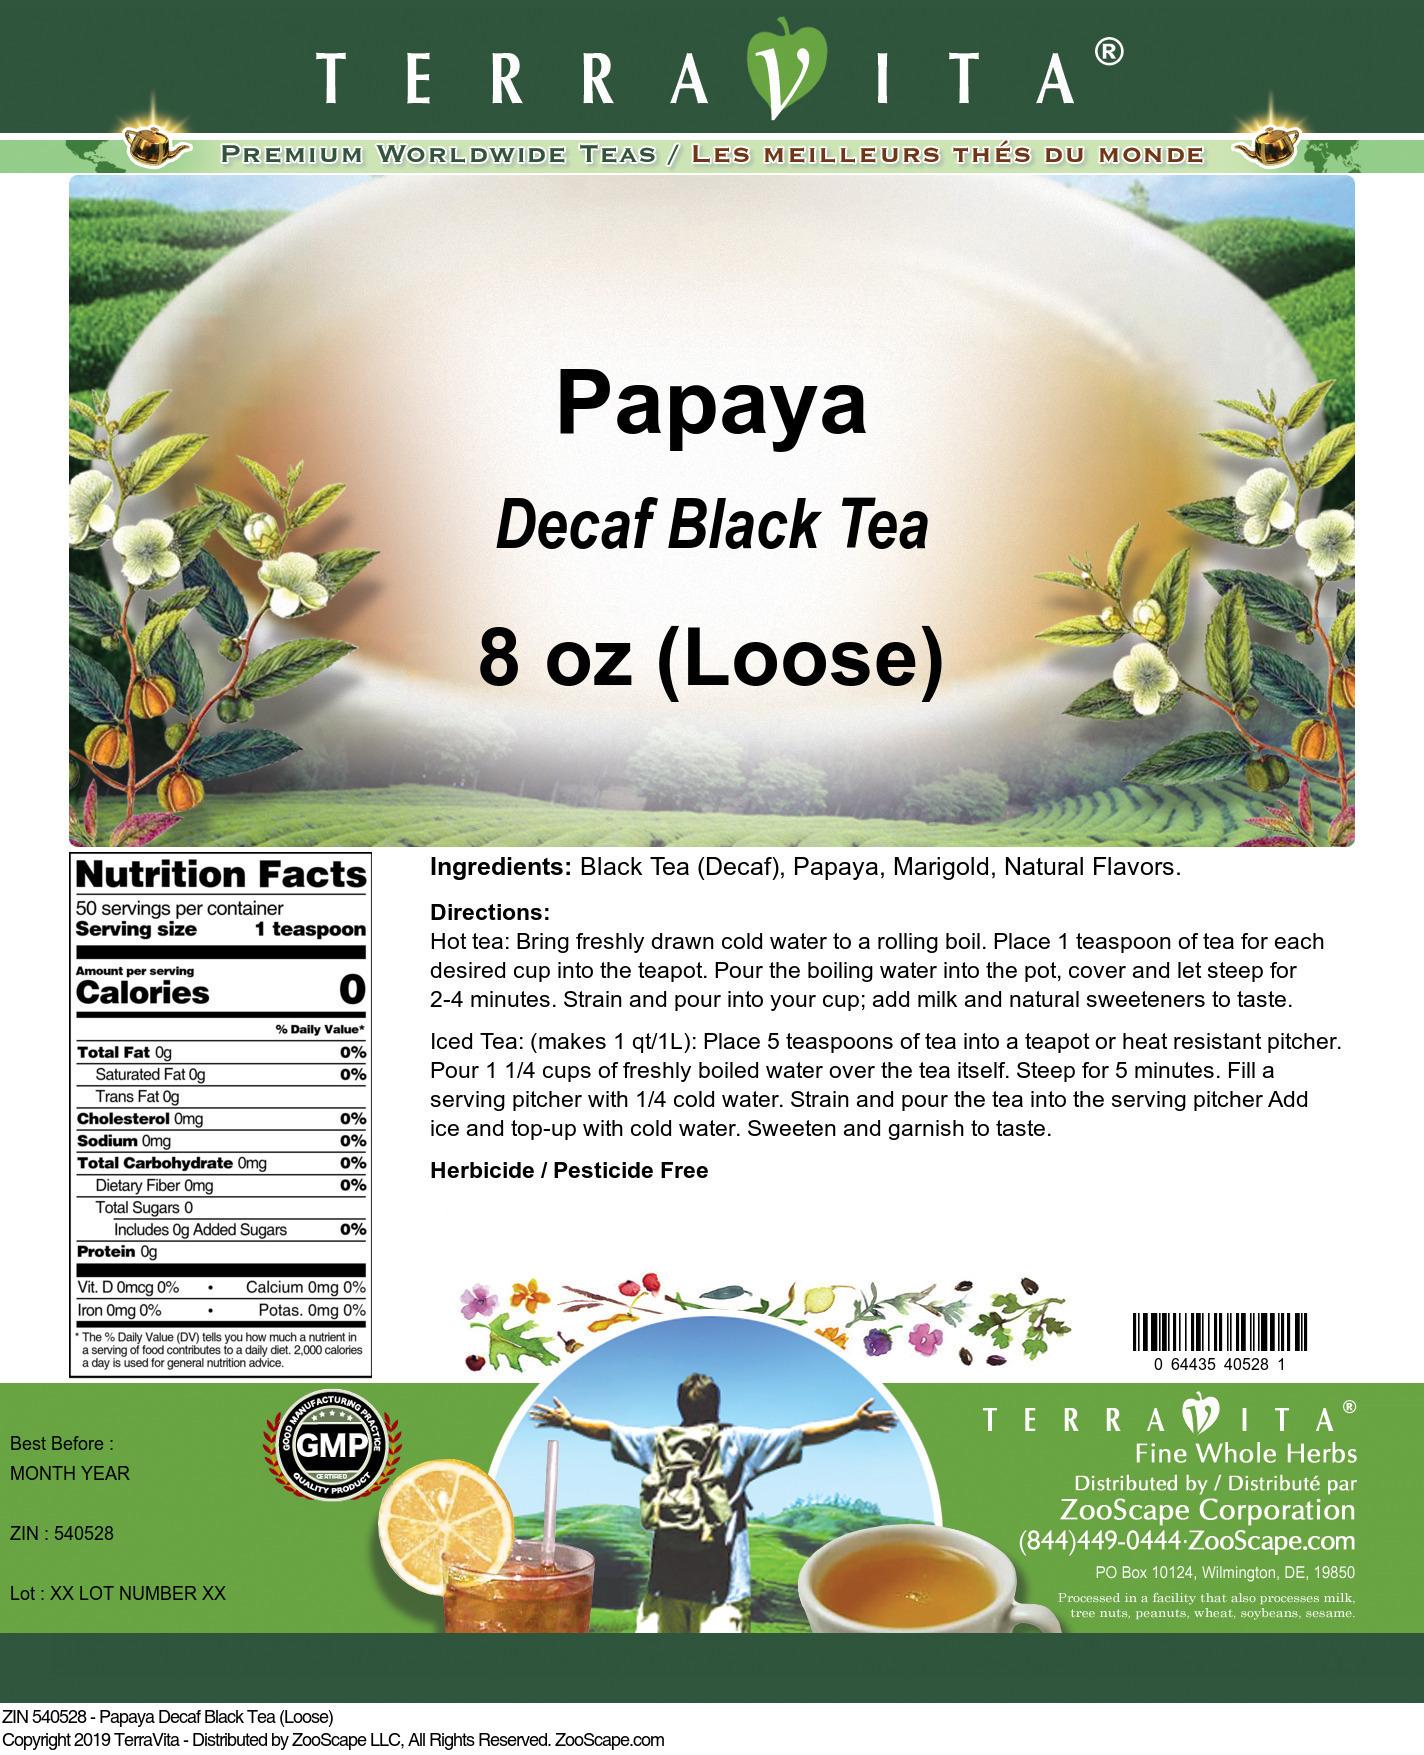 Papaya Decaf Black Tea